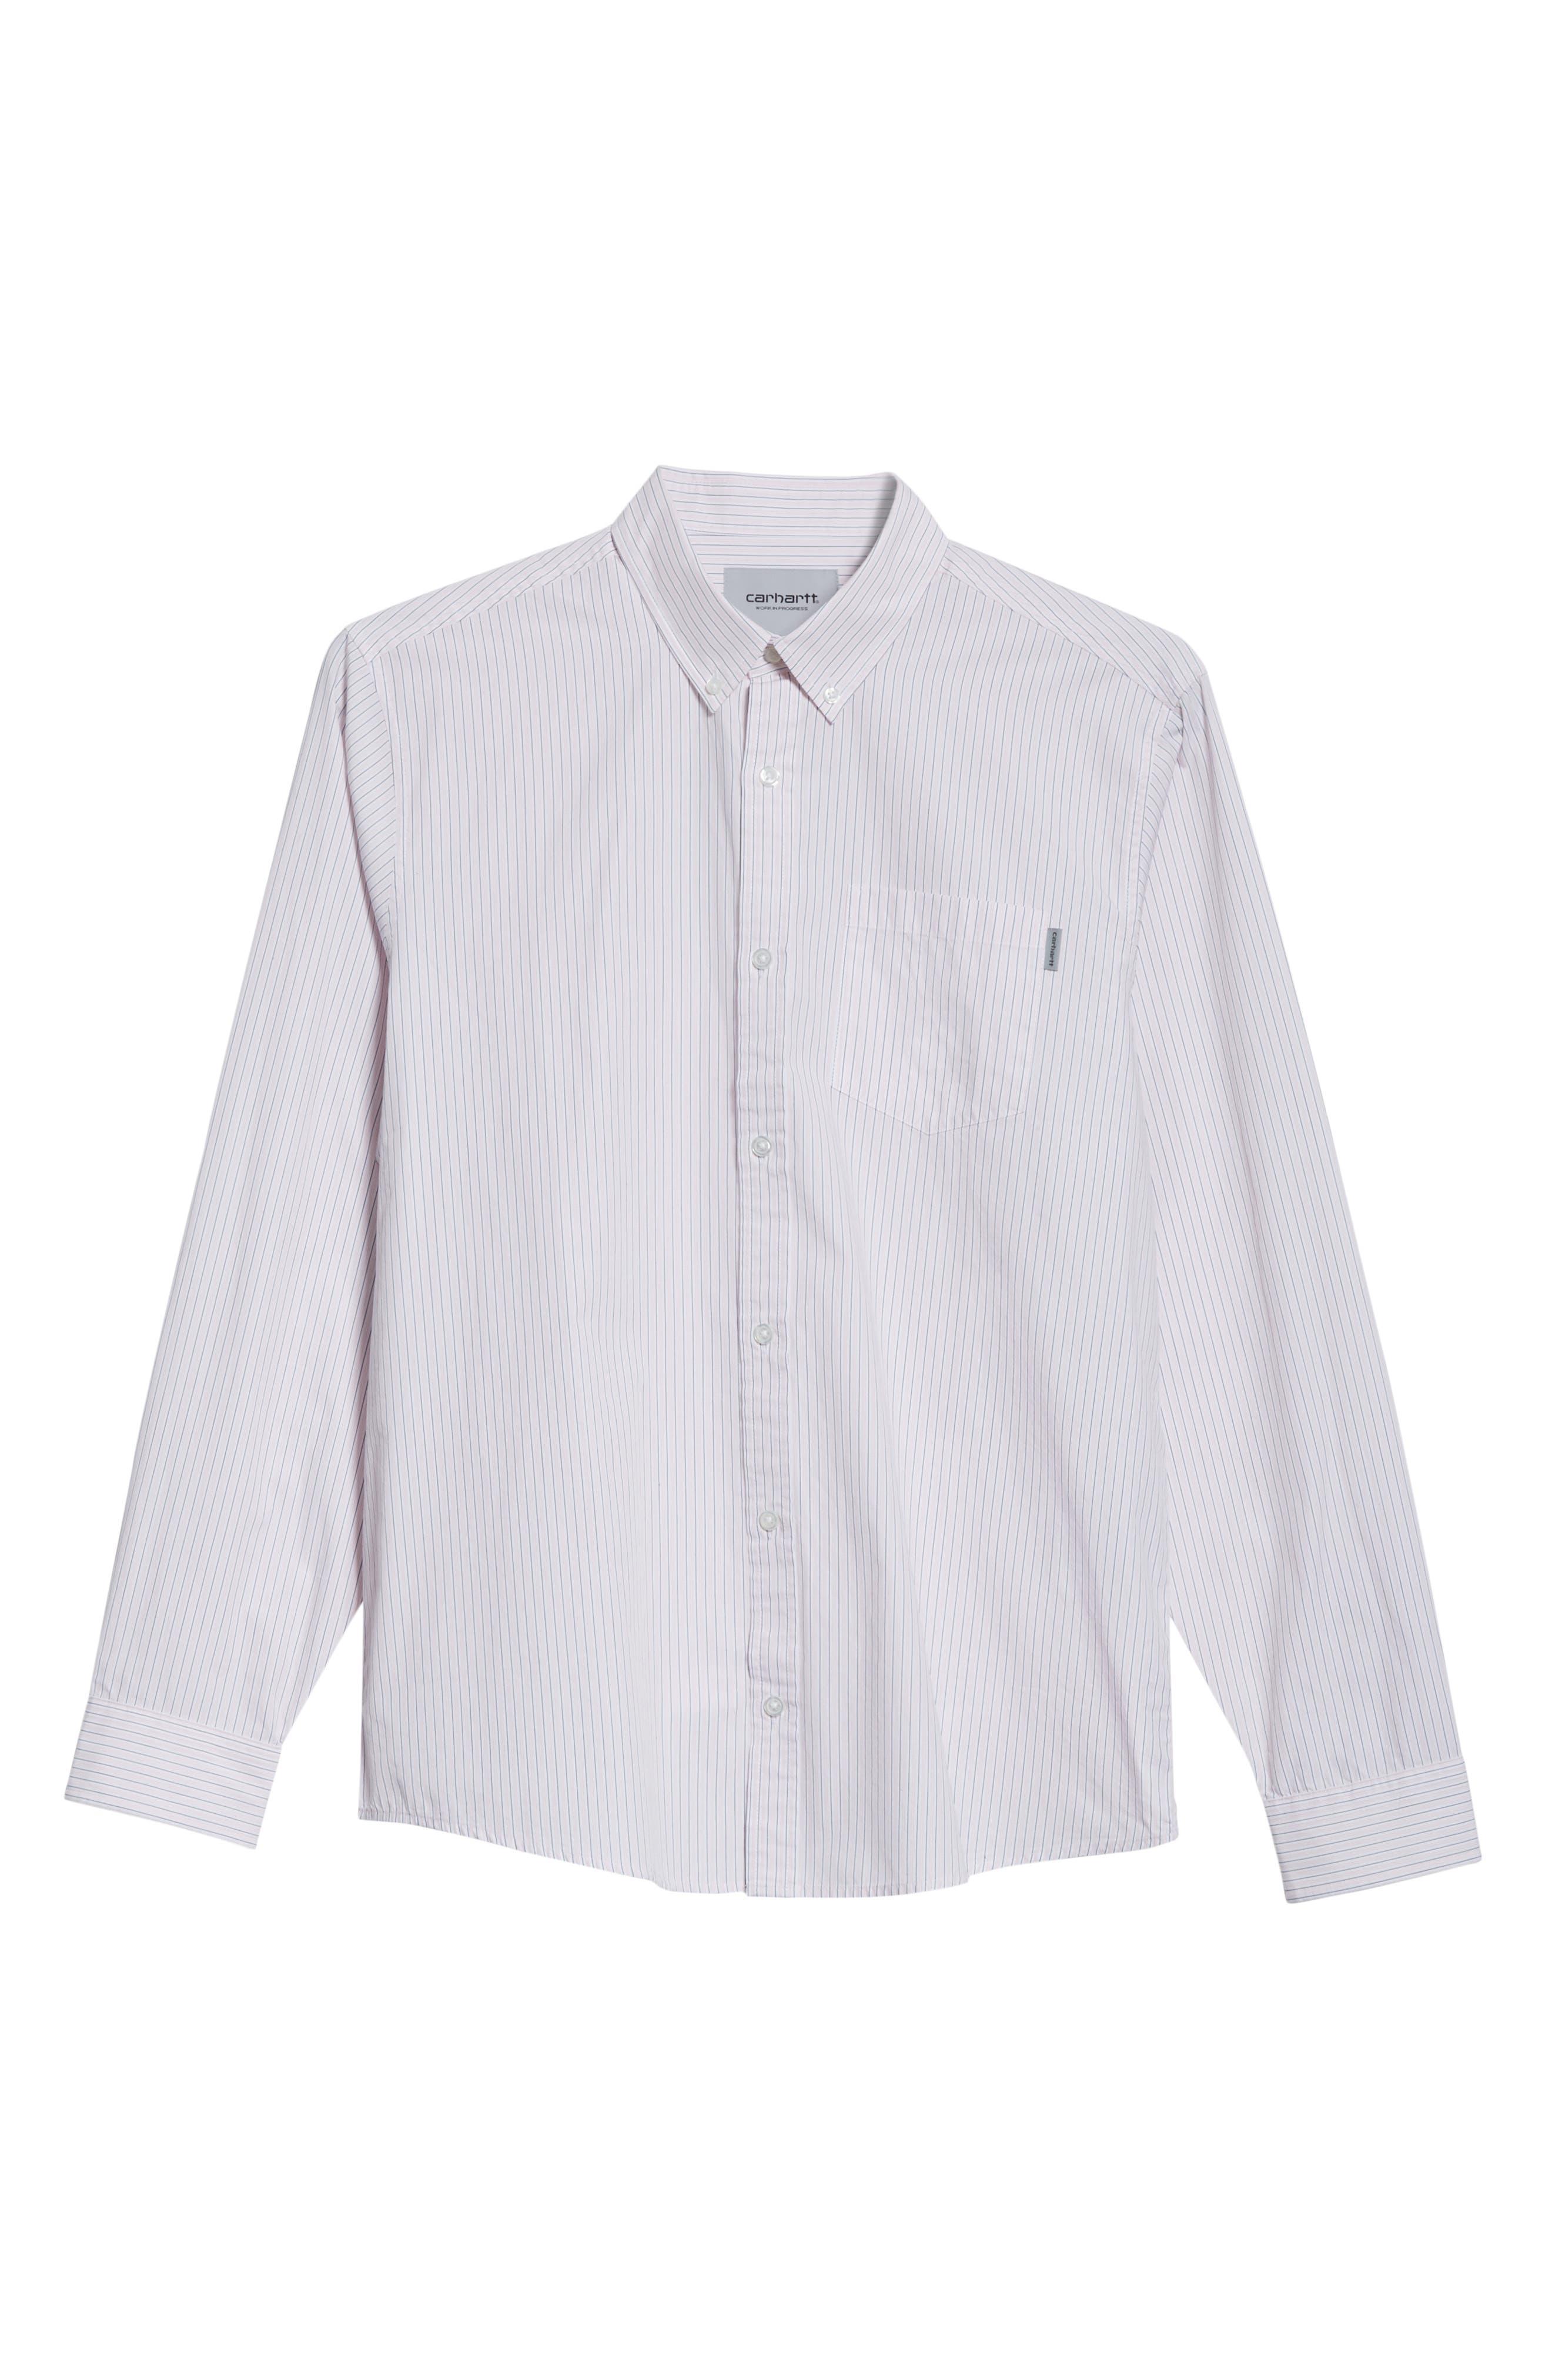 Crane Stripe Woven Shirt,                             Alternate thumbnail 6, color,                             630